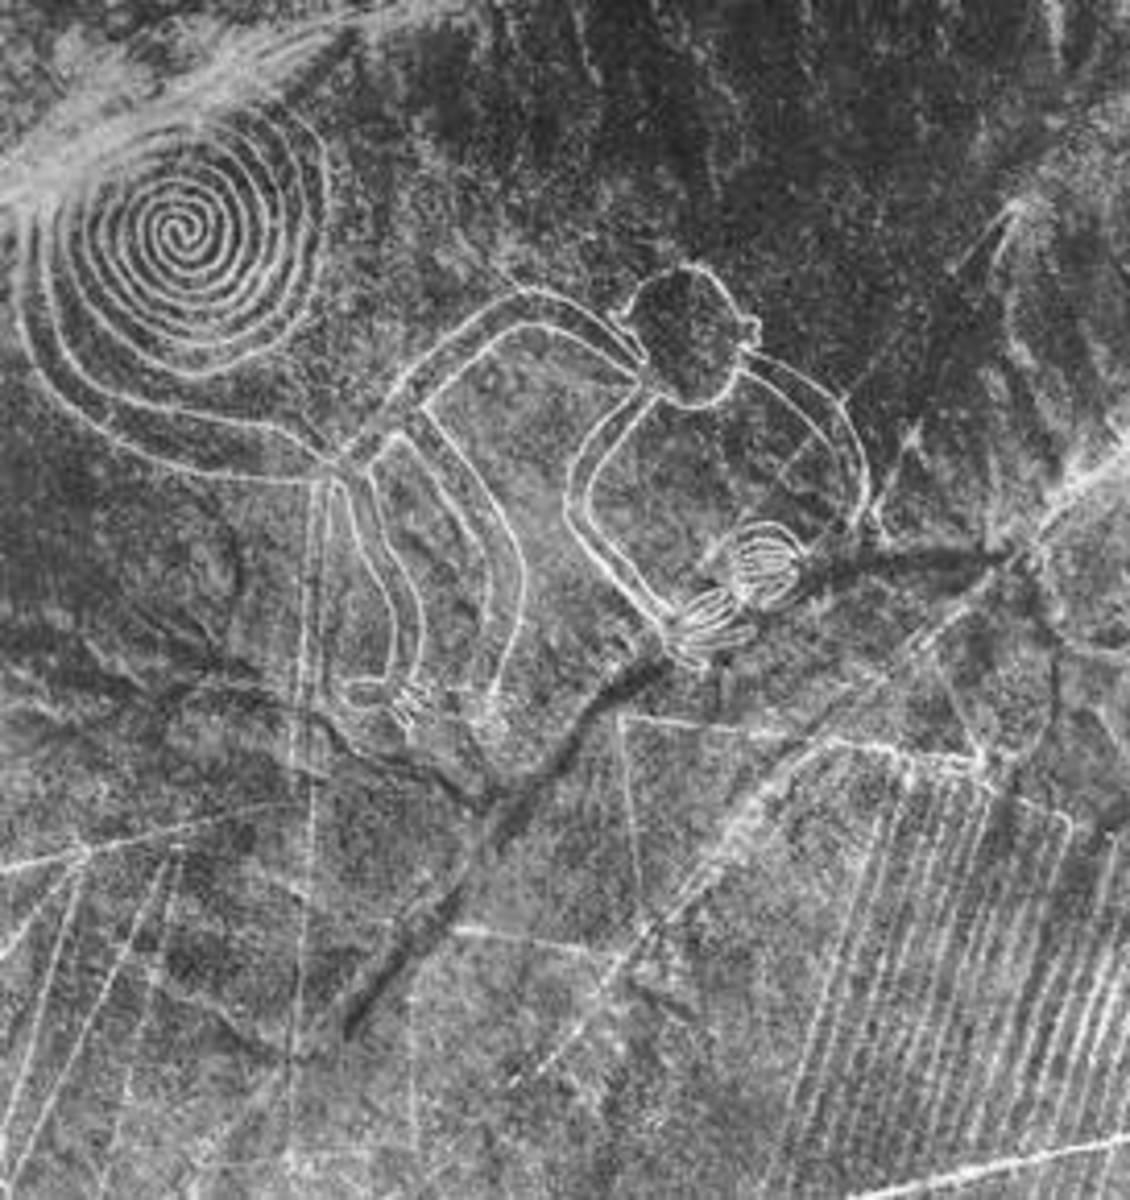 Nasca geoglyph of a monkey